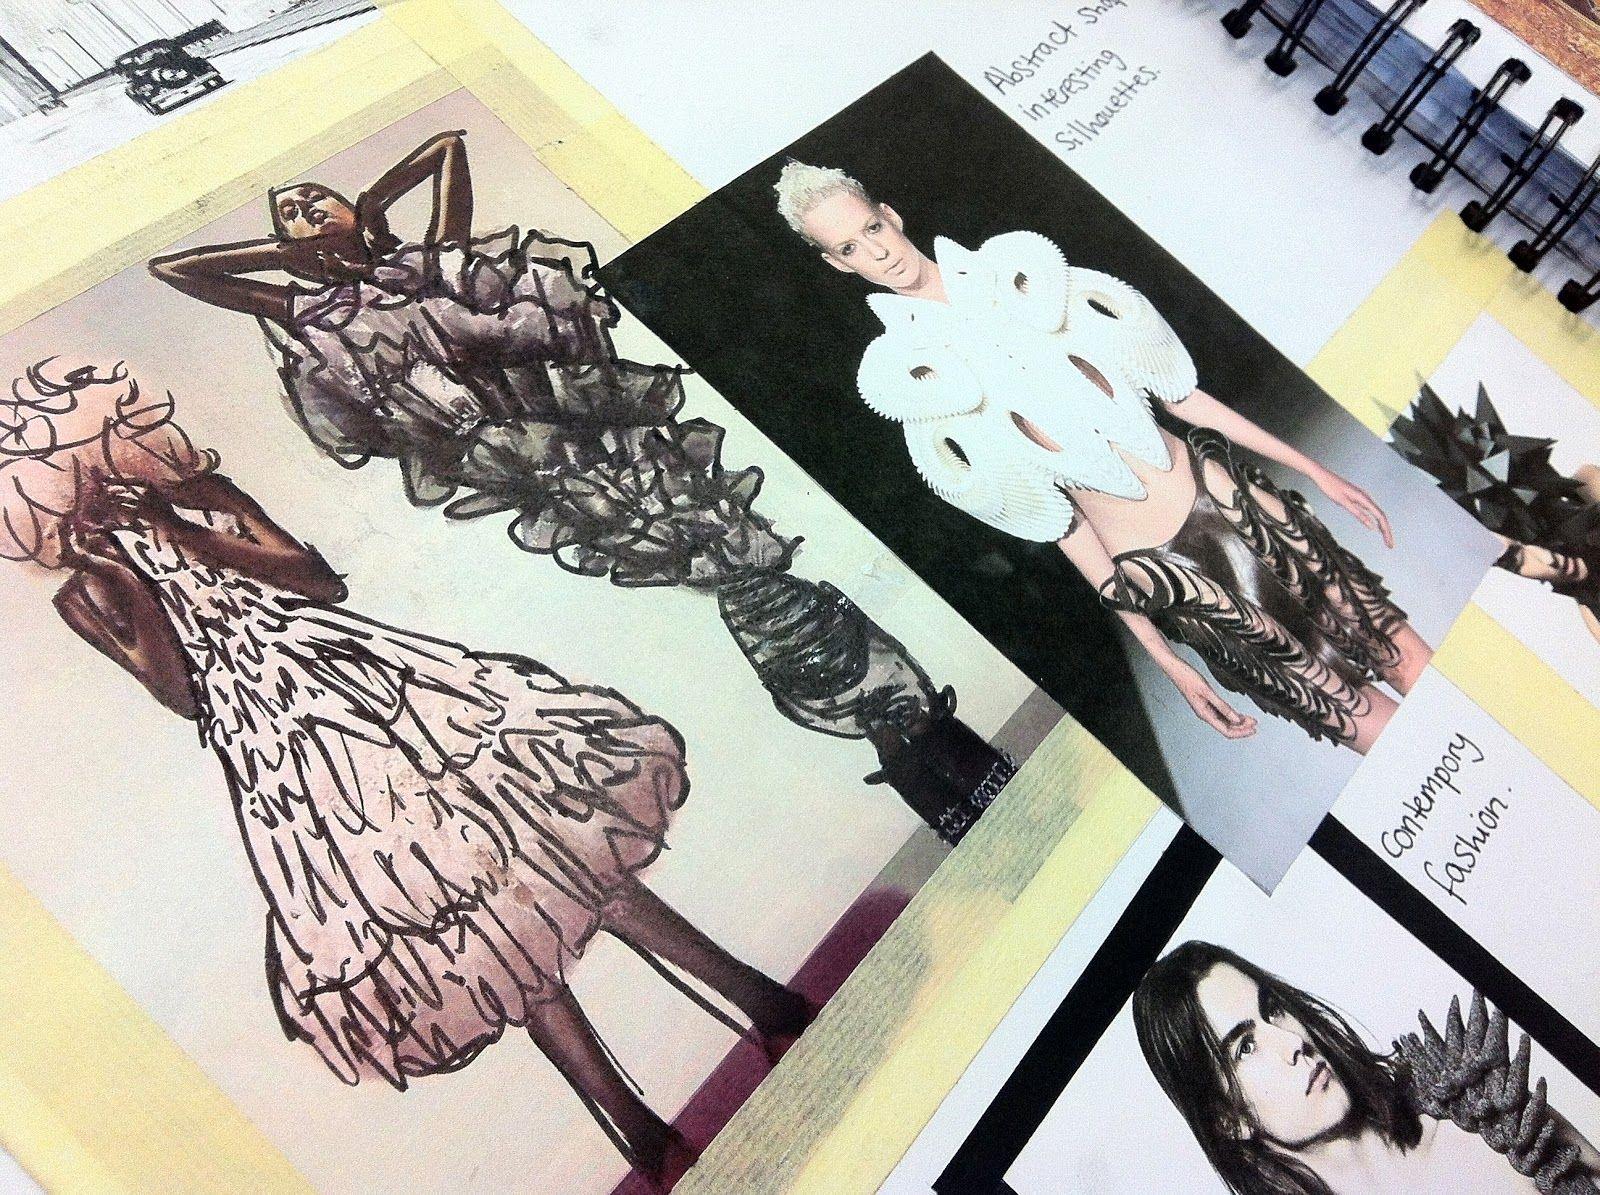 Fashion Sketchbook structural & abstract fashion design development (littlevioletribbon.blogspot.co.uk)